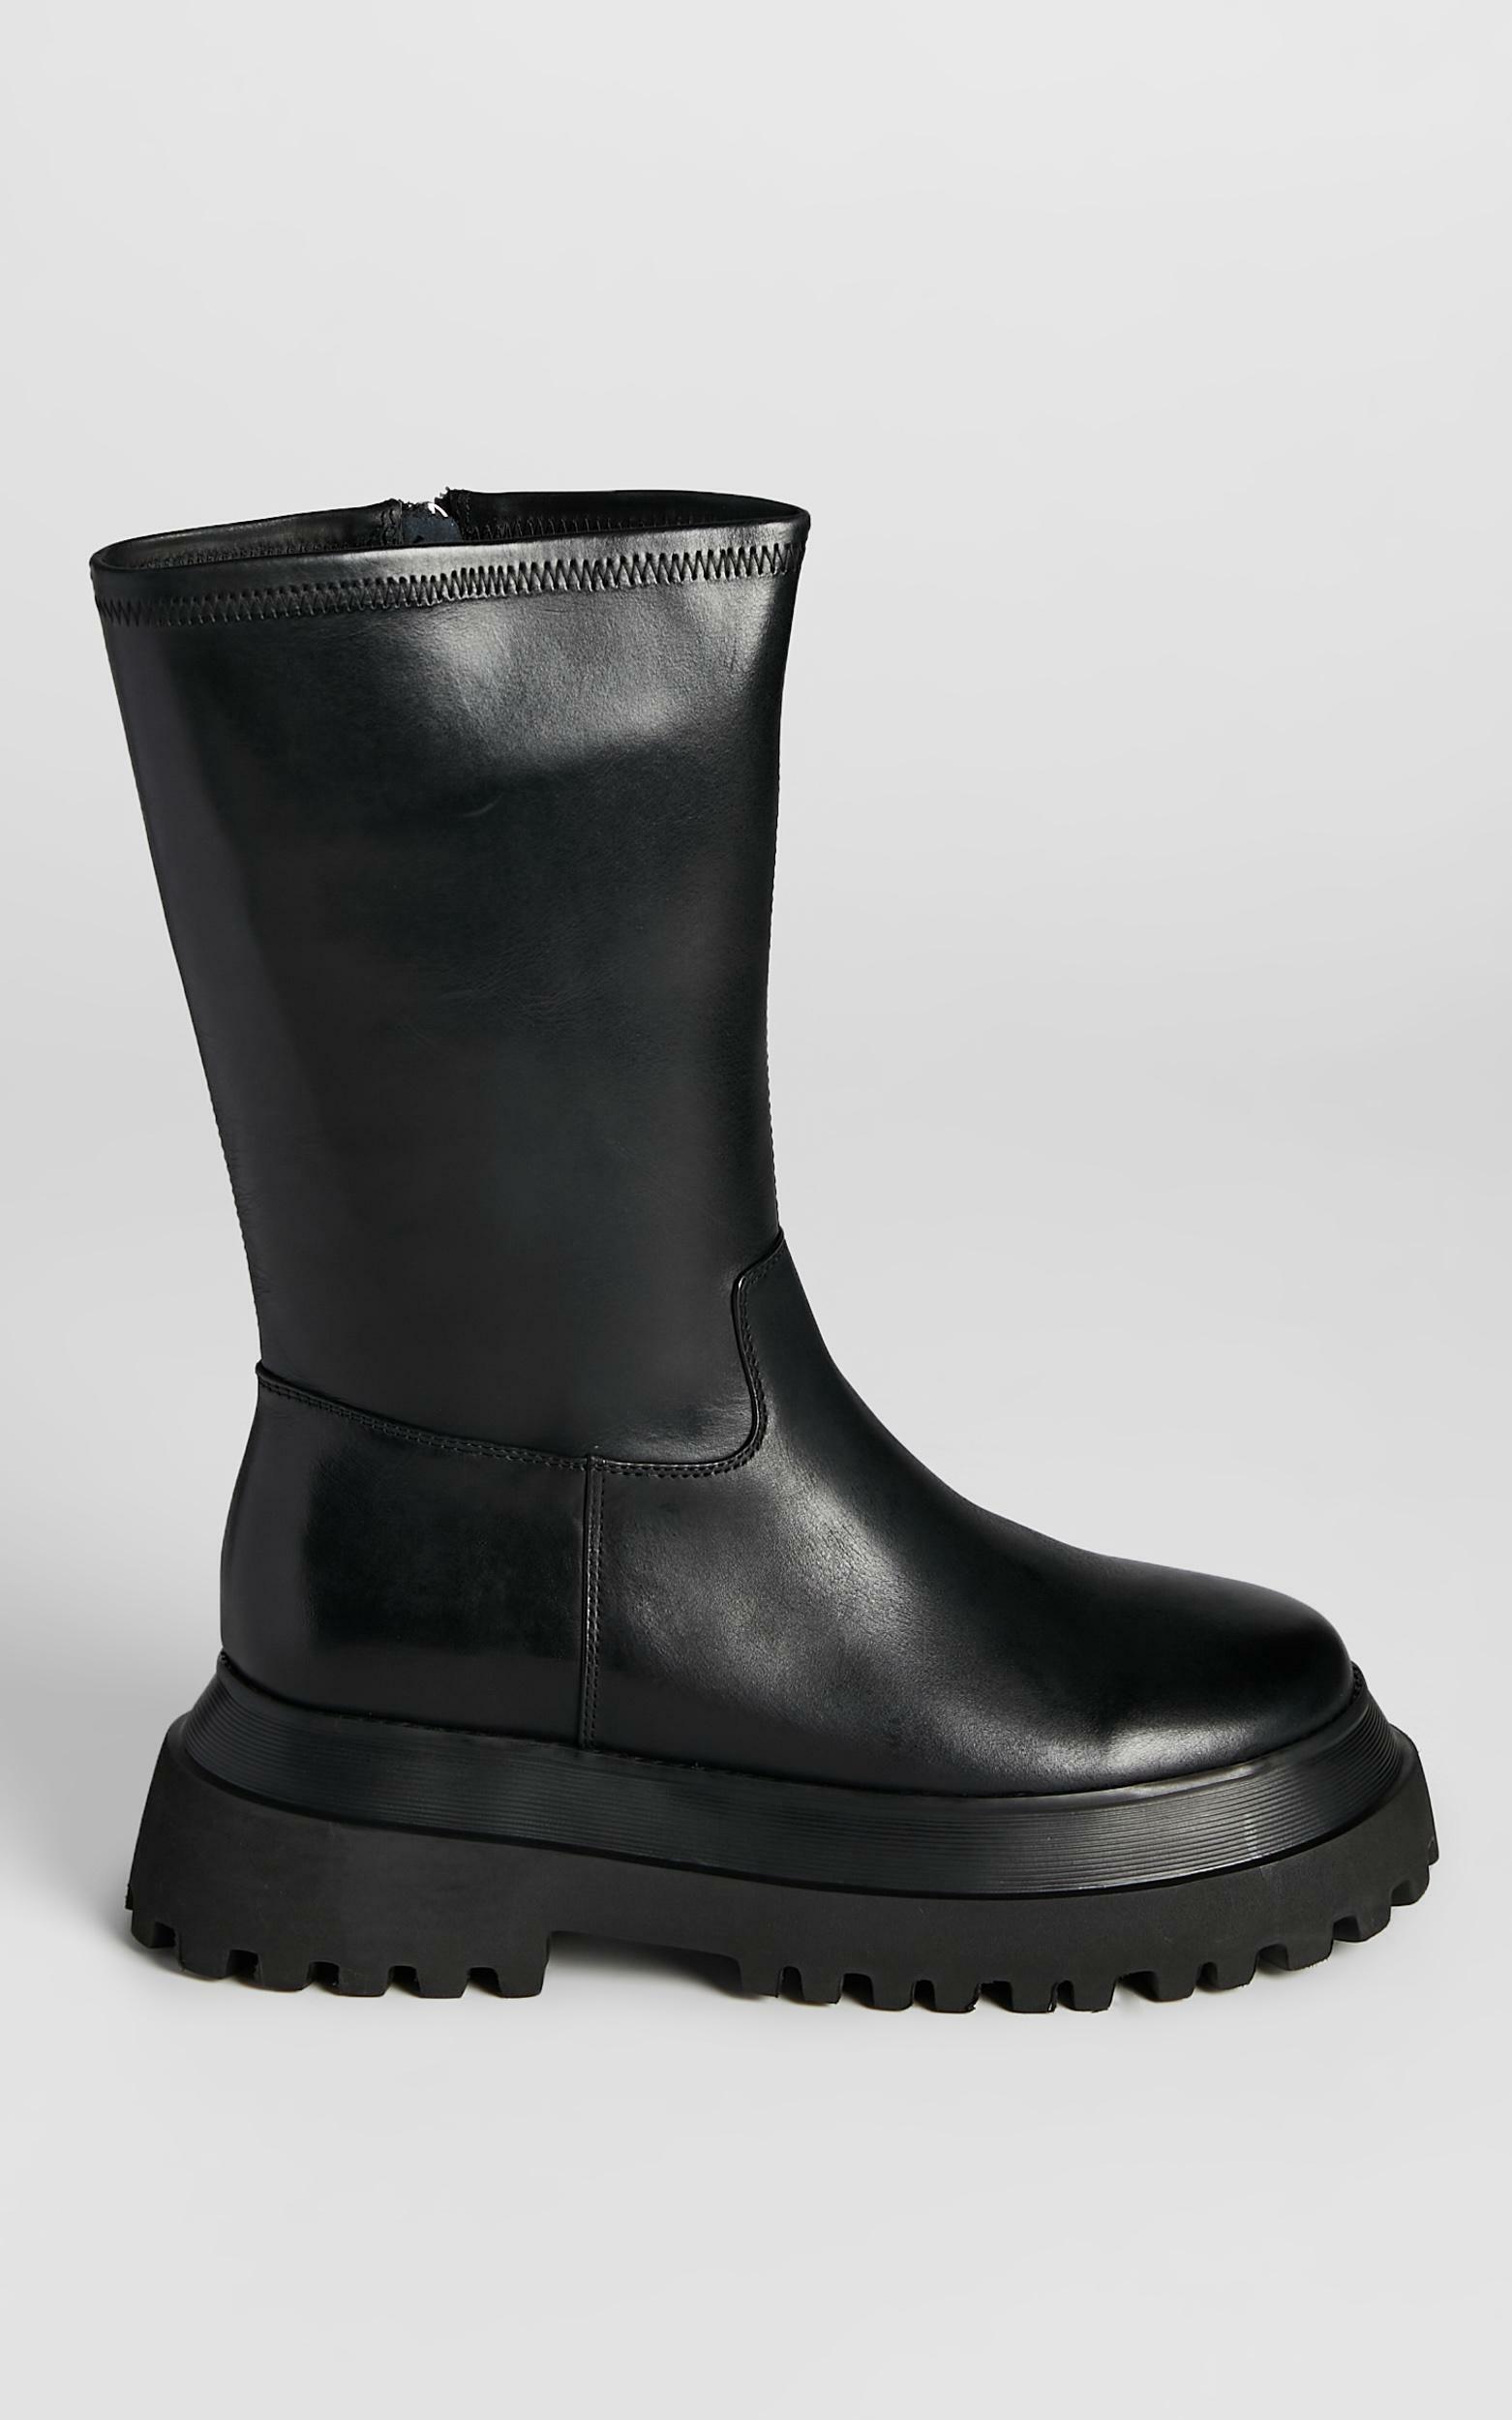 Alias Mae - Nixon Boots in Black Burnished - 5.5, BLK2, hi-res image number null